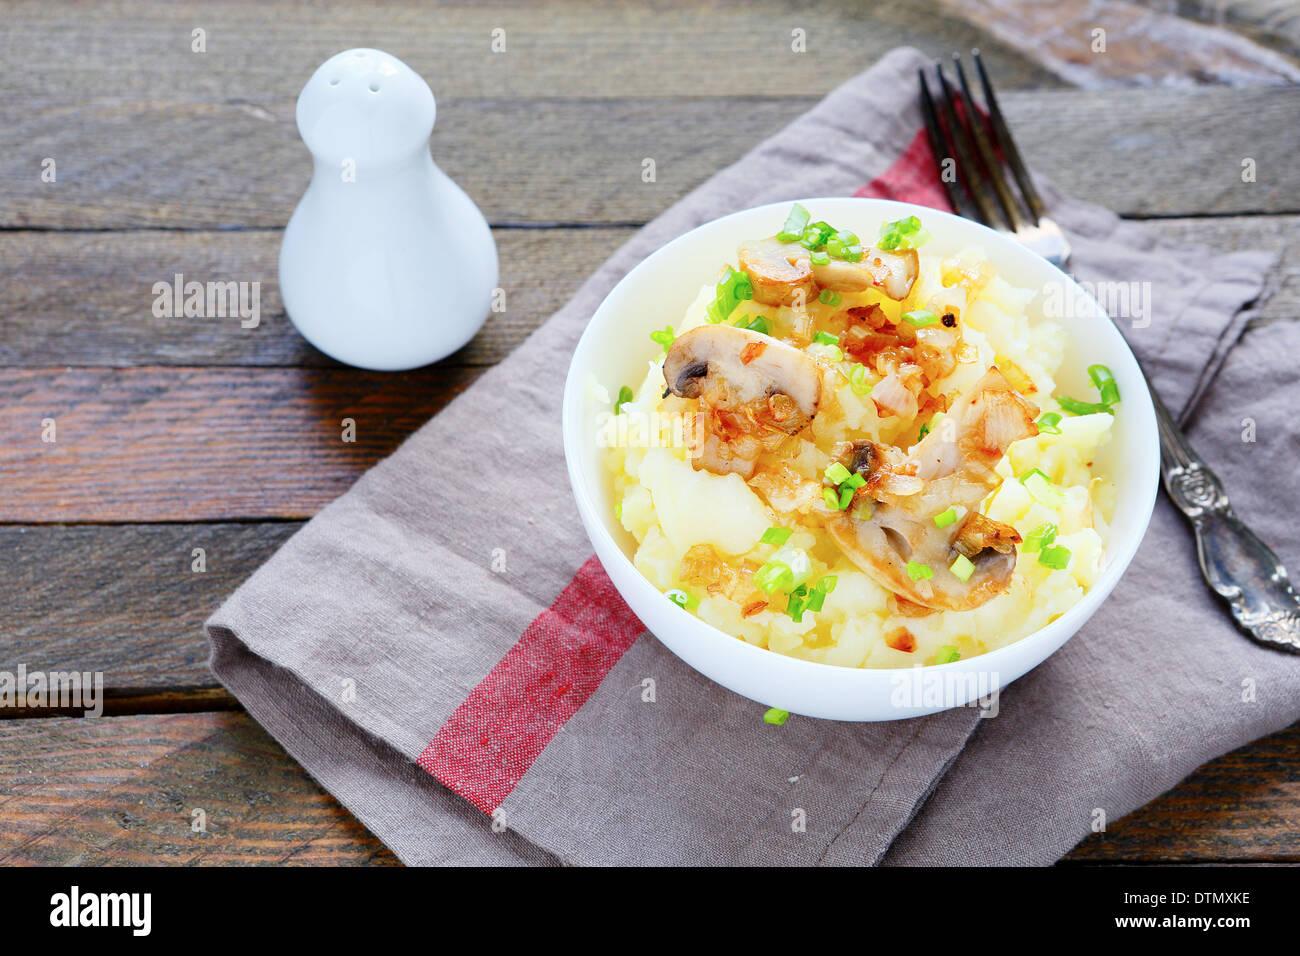 mashed potatoes with mushrooms, food closeup - Stock Image